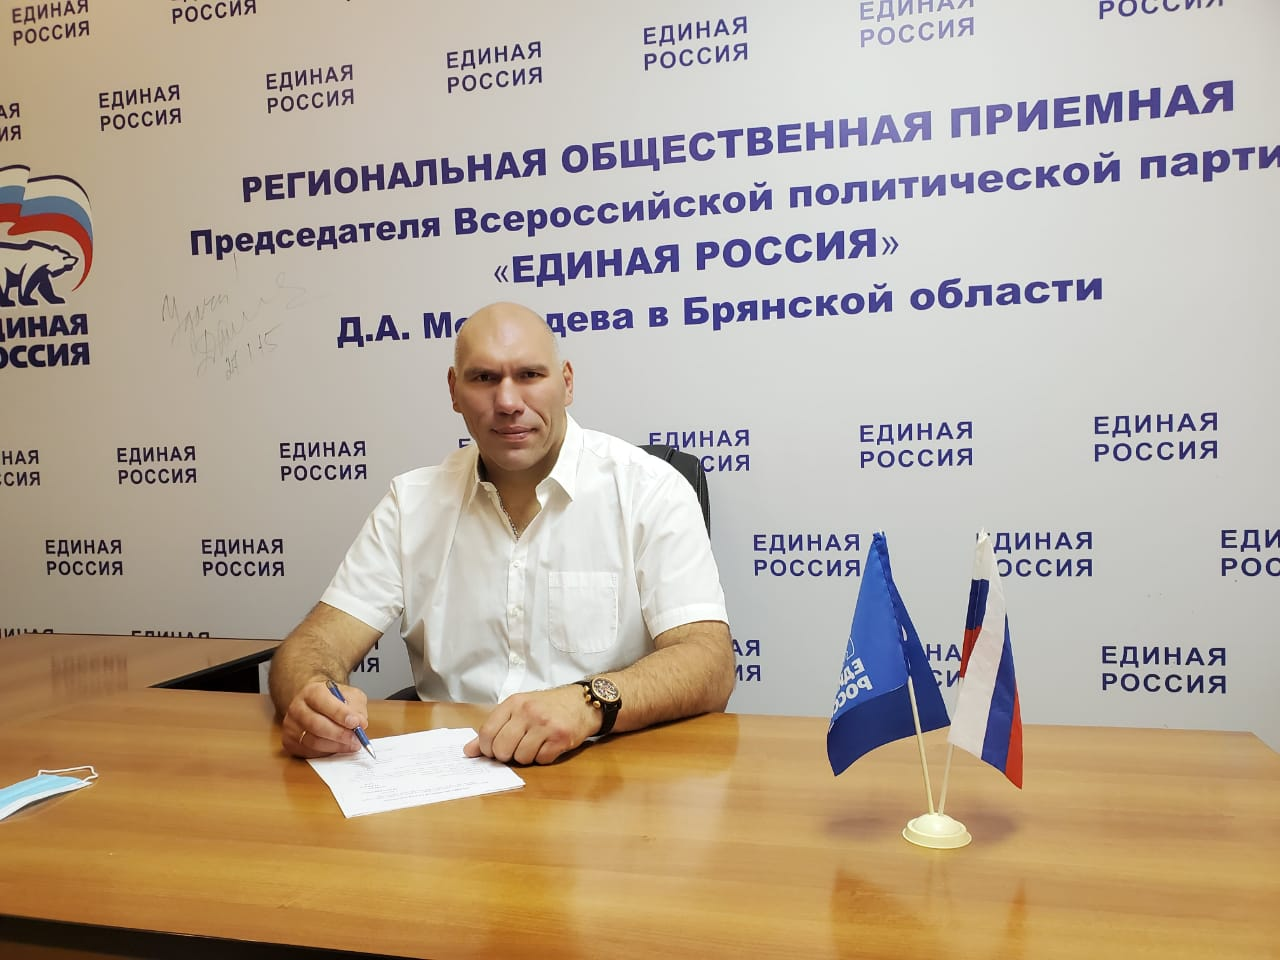 Валуев похвалил Лукашенко за видео с автоматом